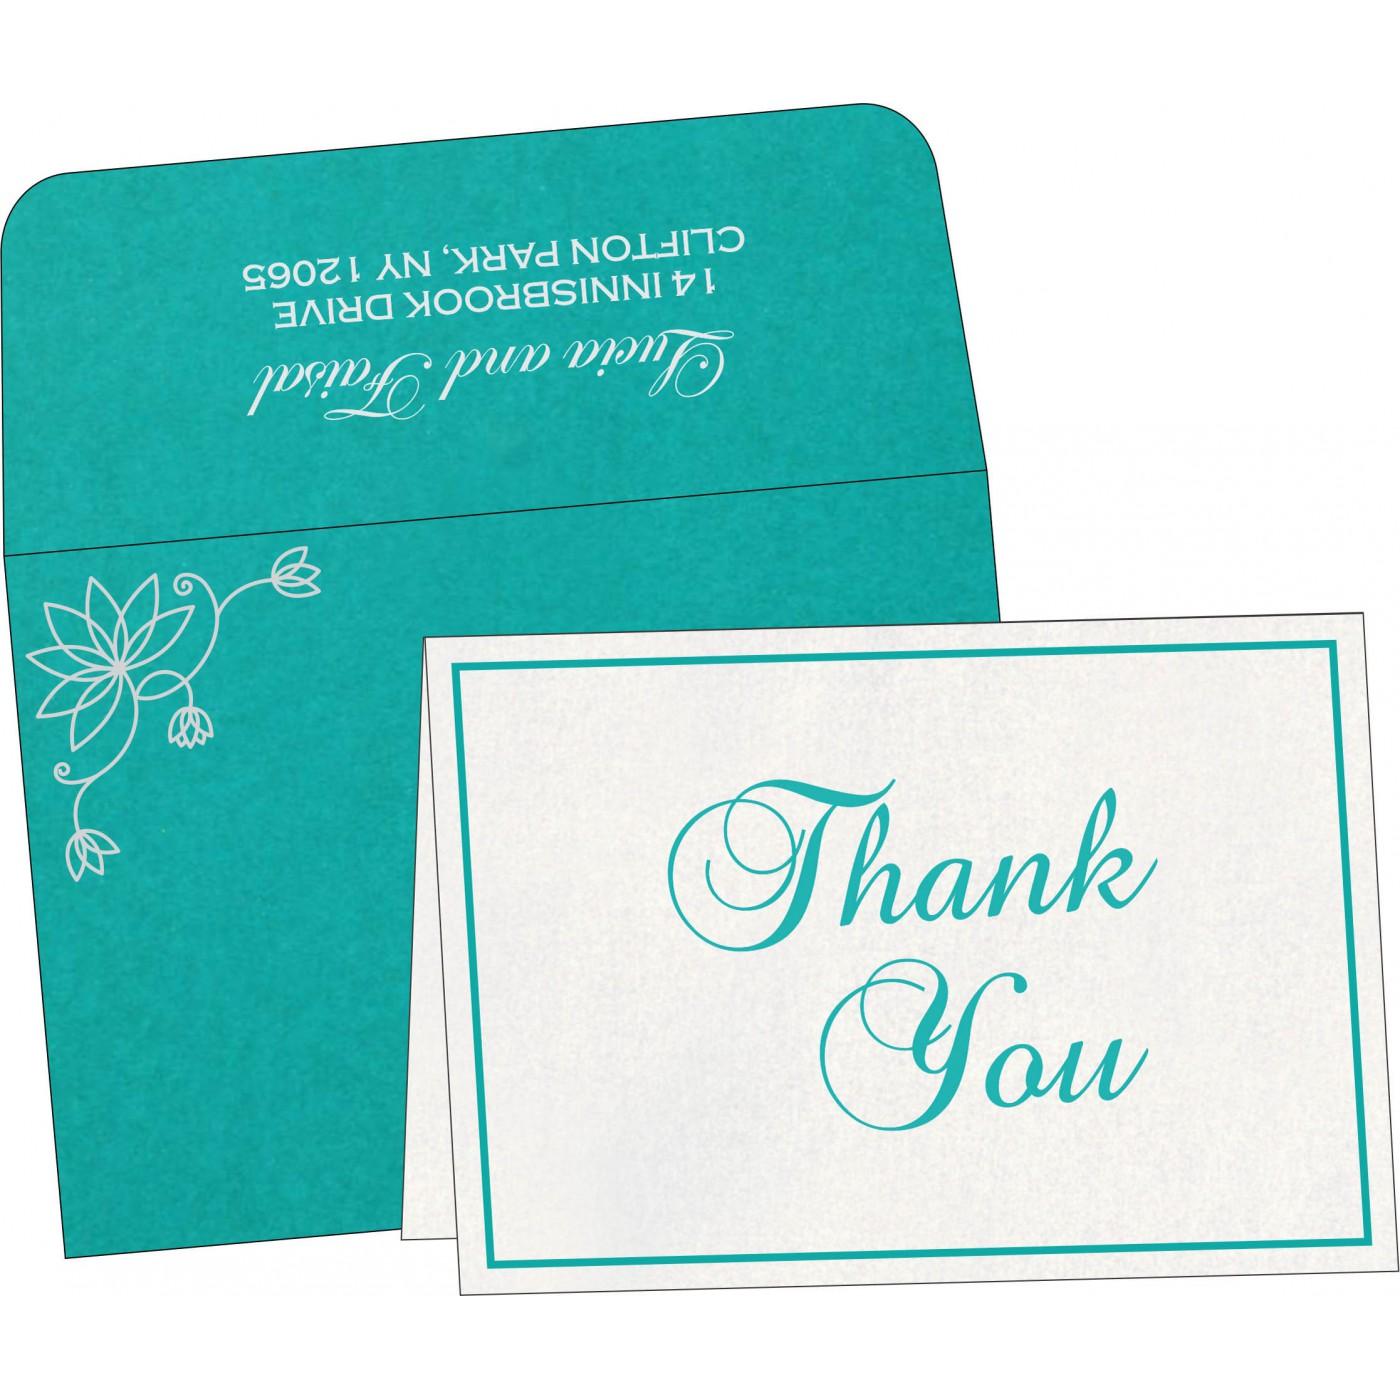 Thank You Cards : TYC-8251A - 123WeddingCards